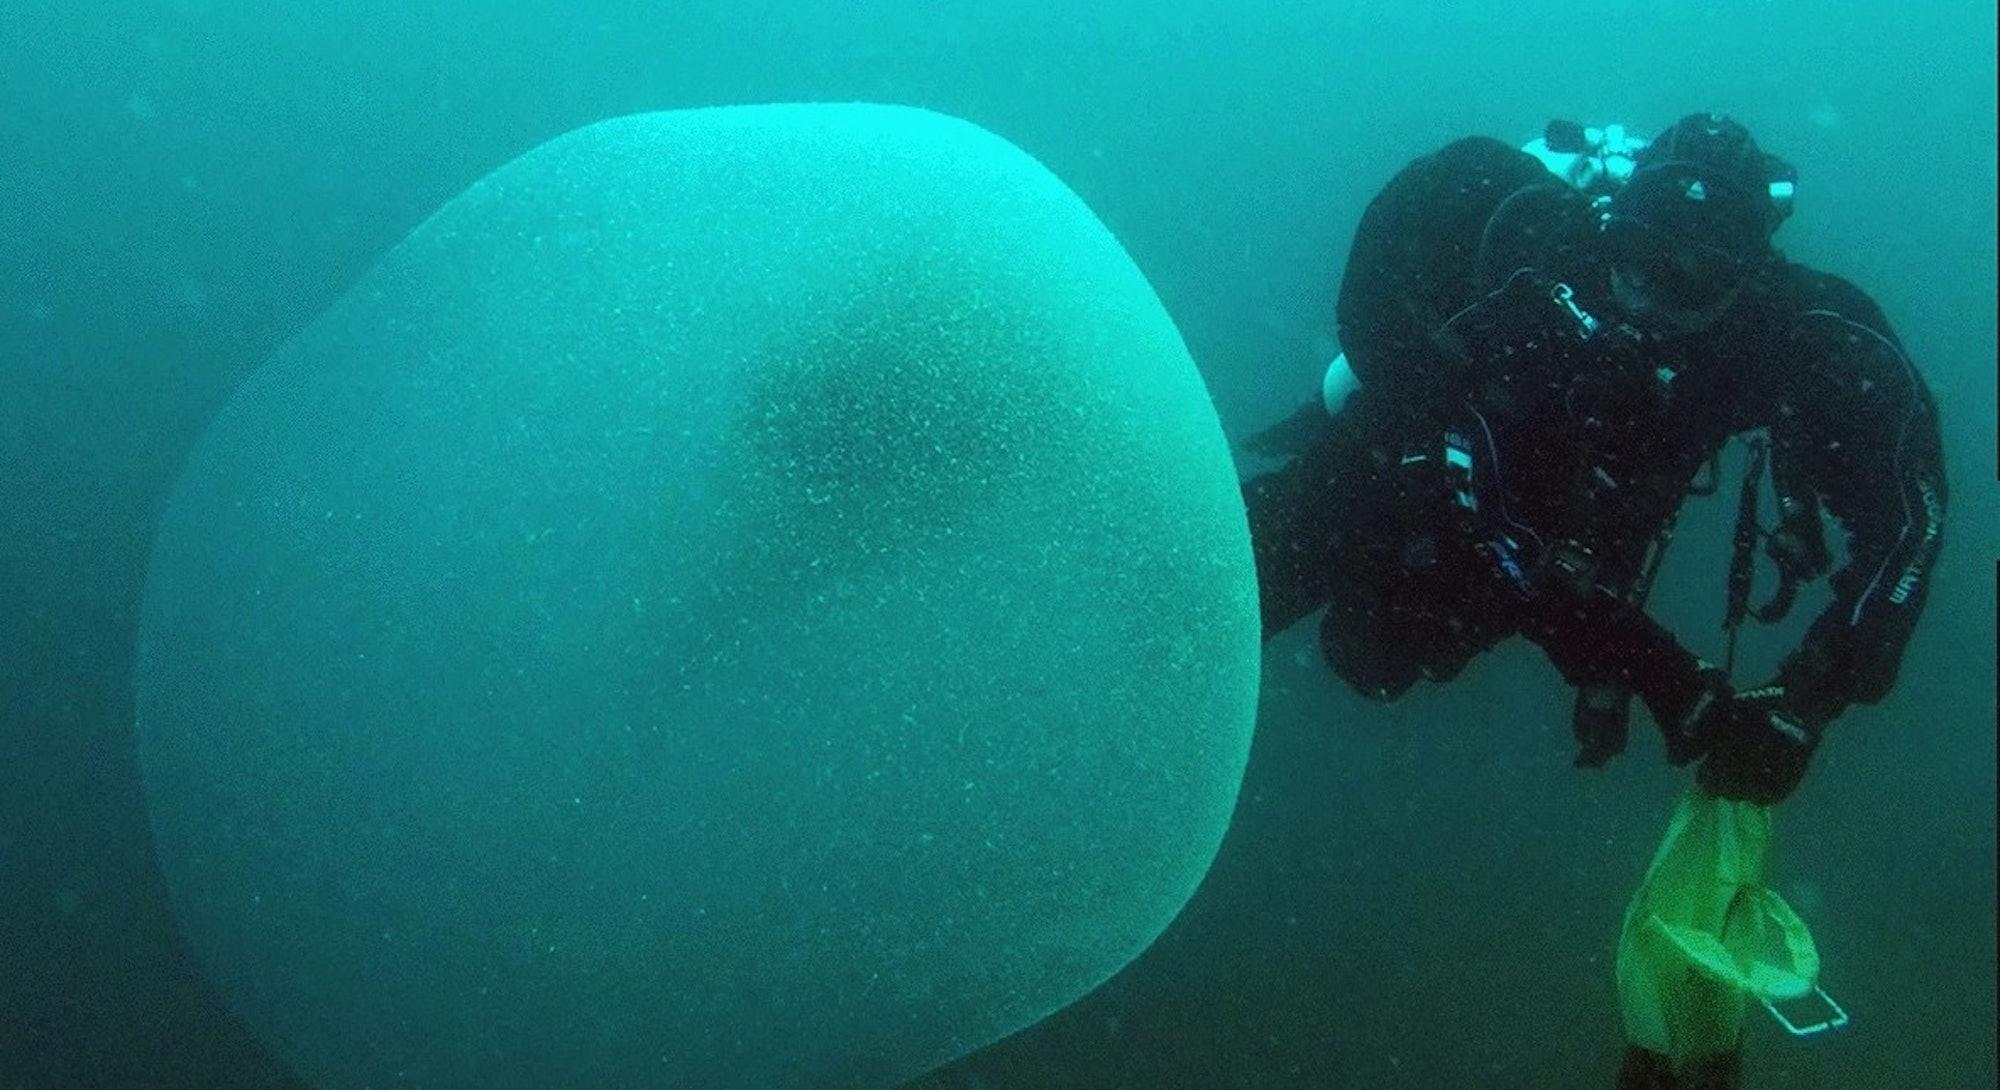 diver examines giant sphere underwater